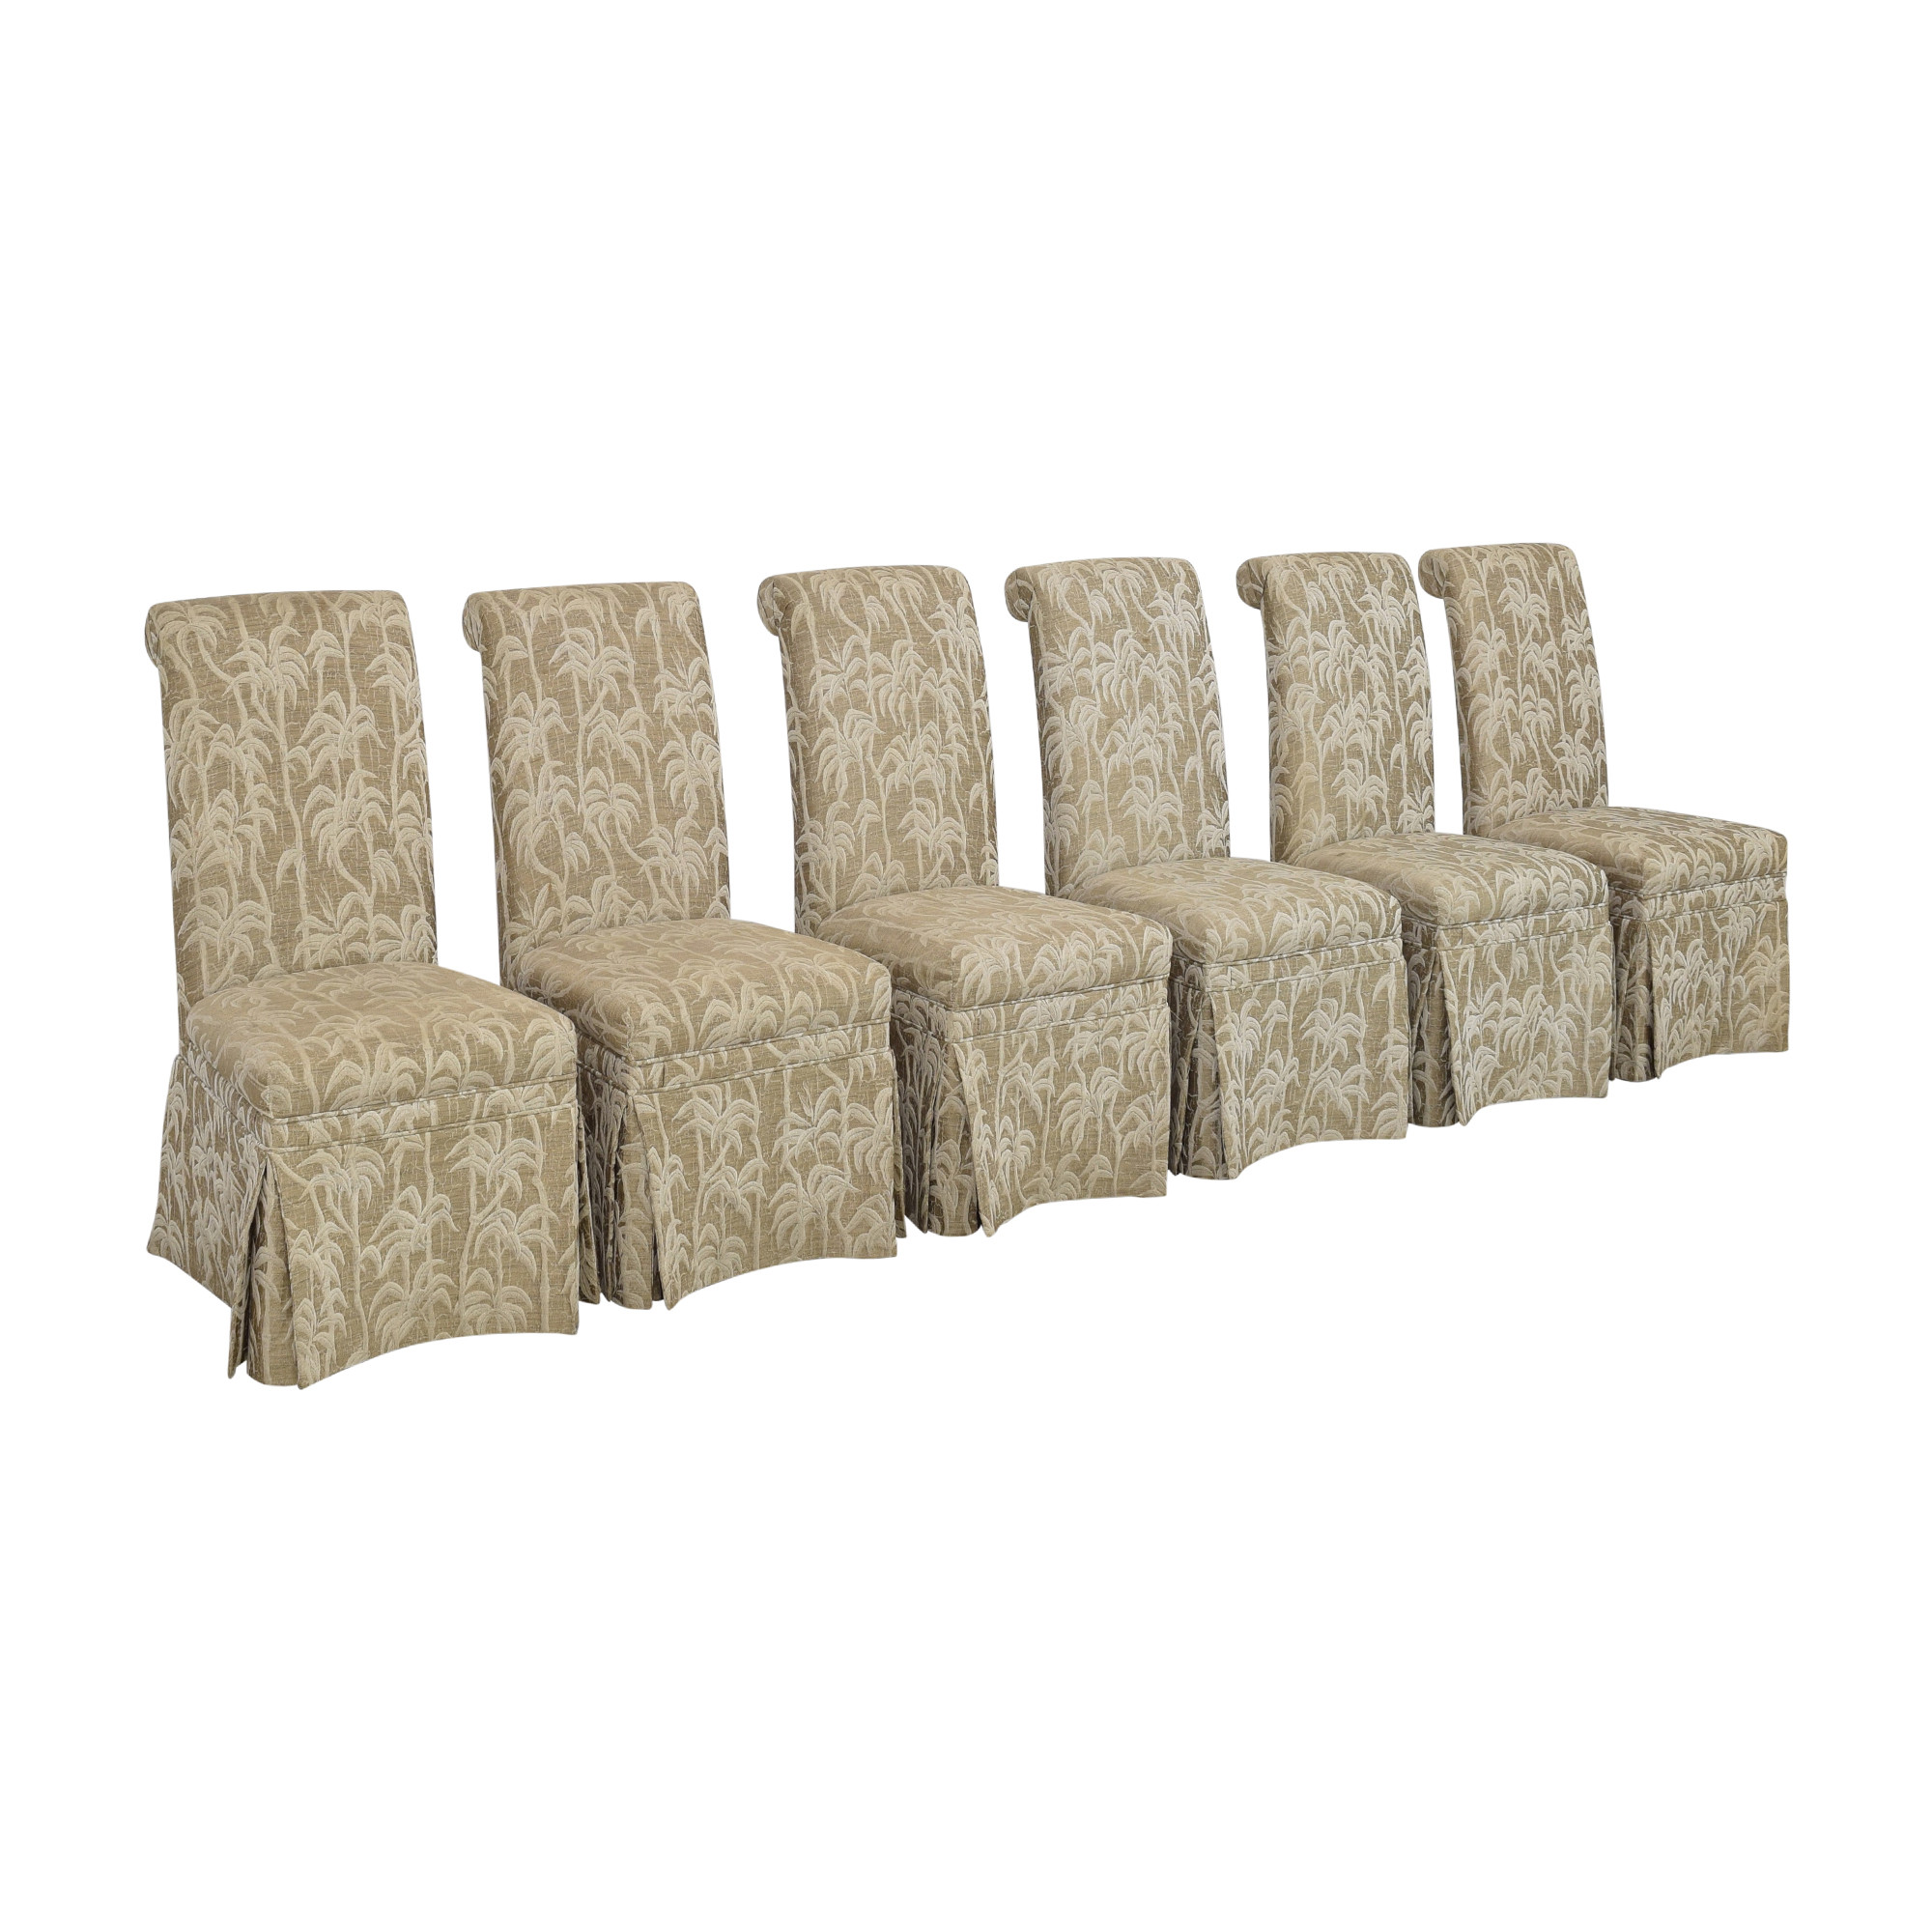 Palm Tree Scroll Back Dining Chairs nj